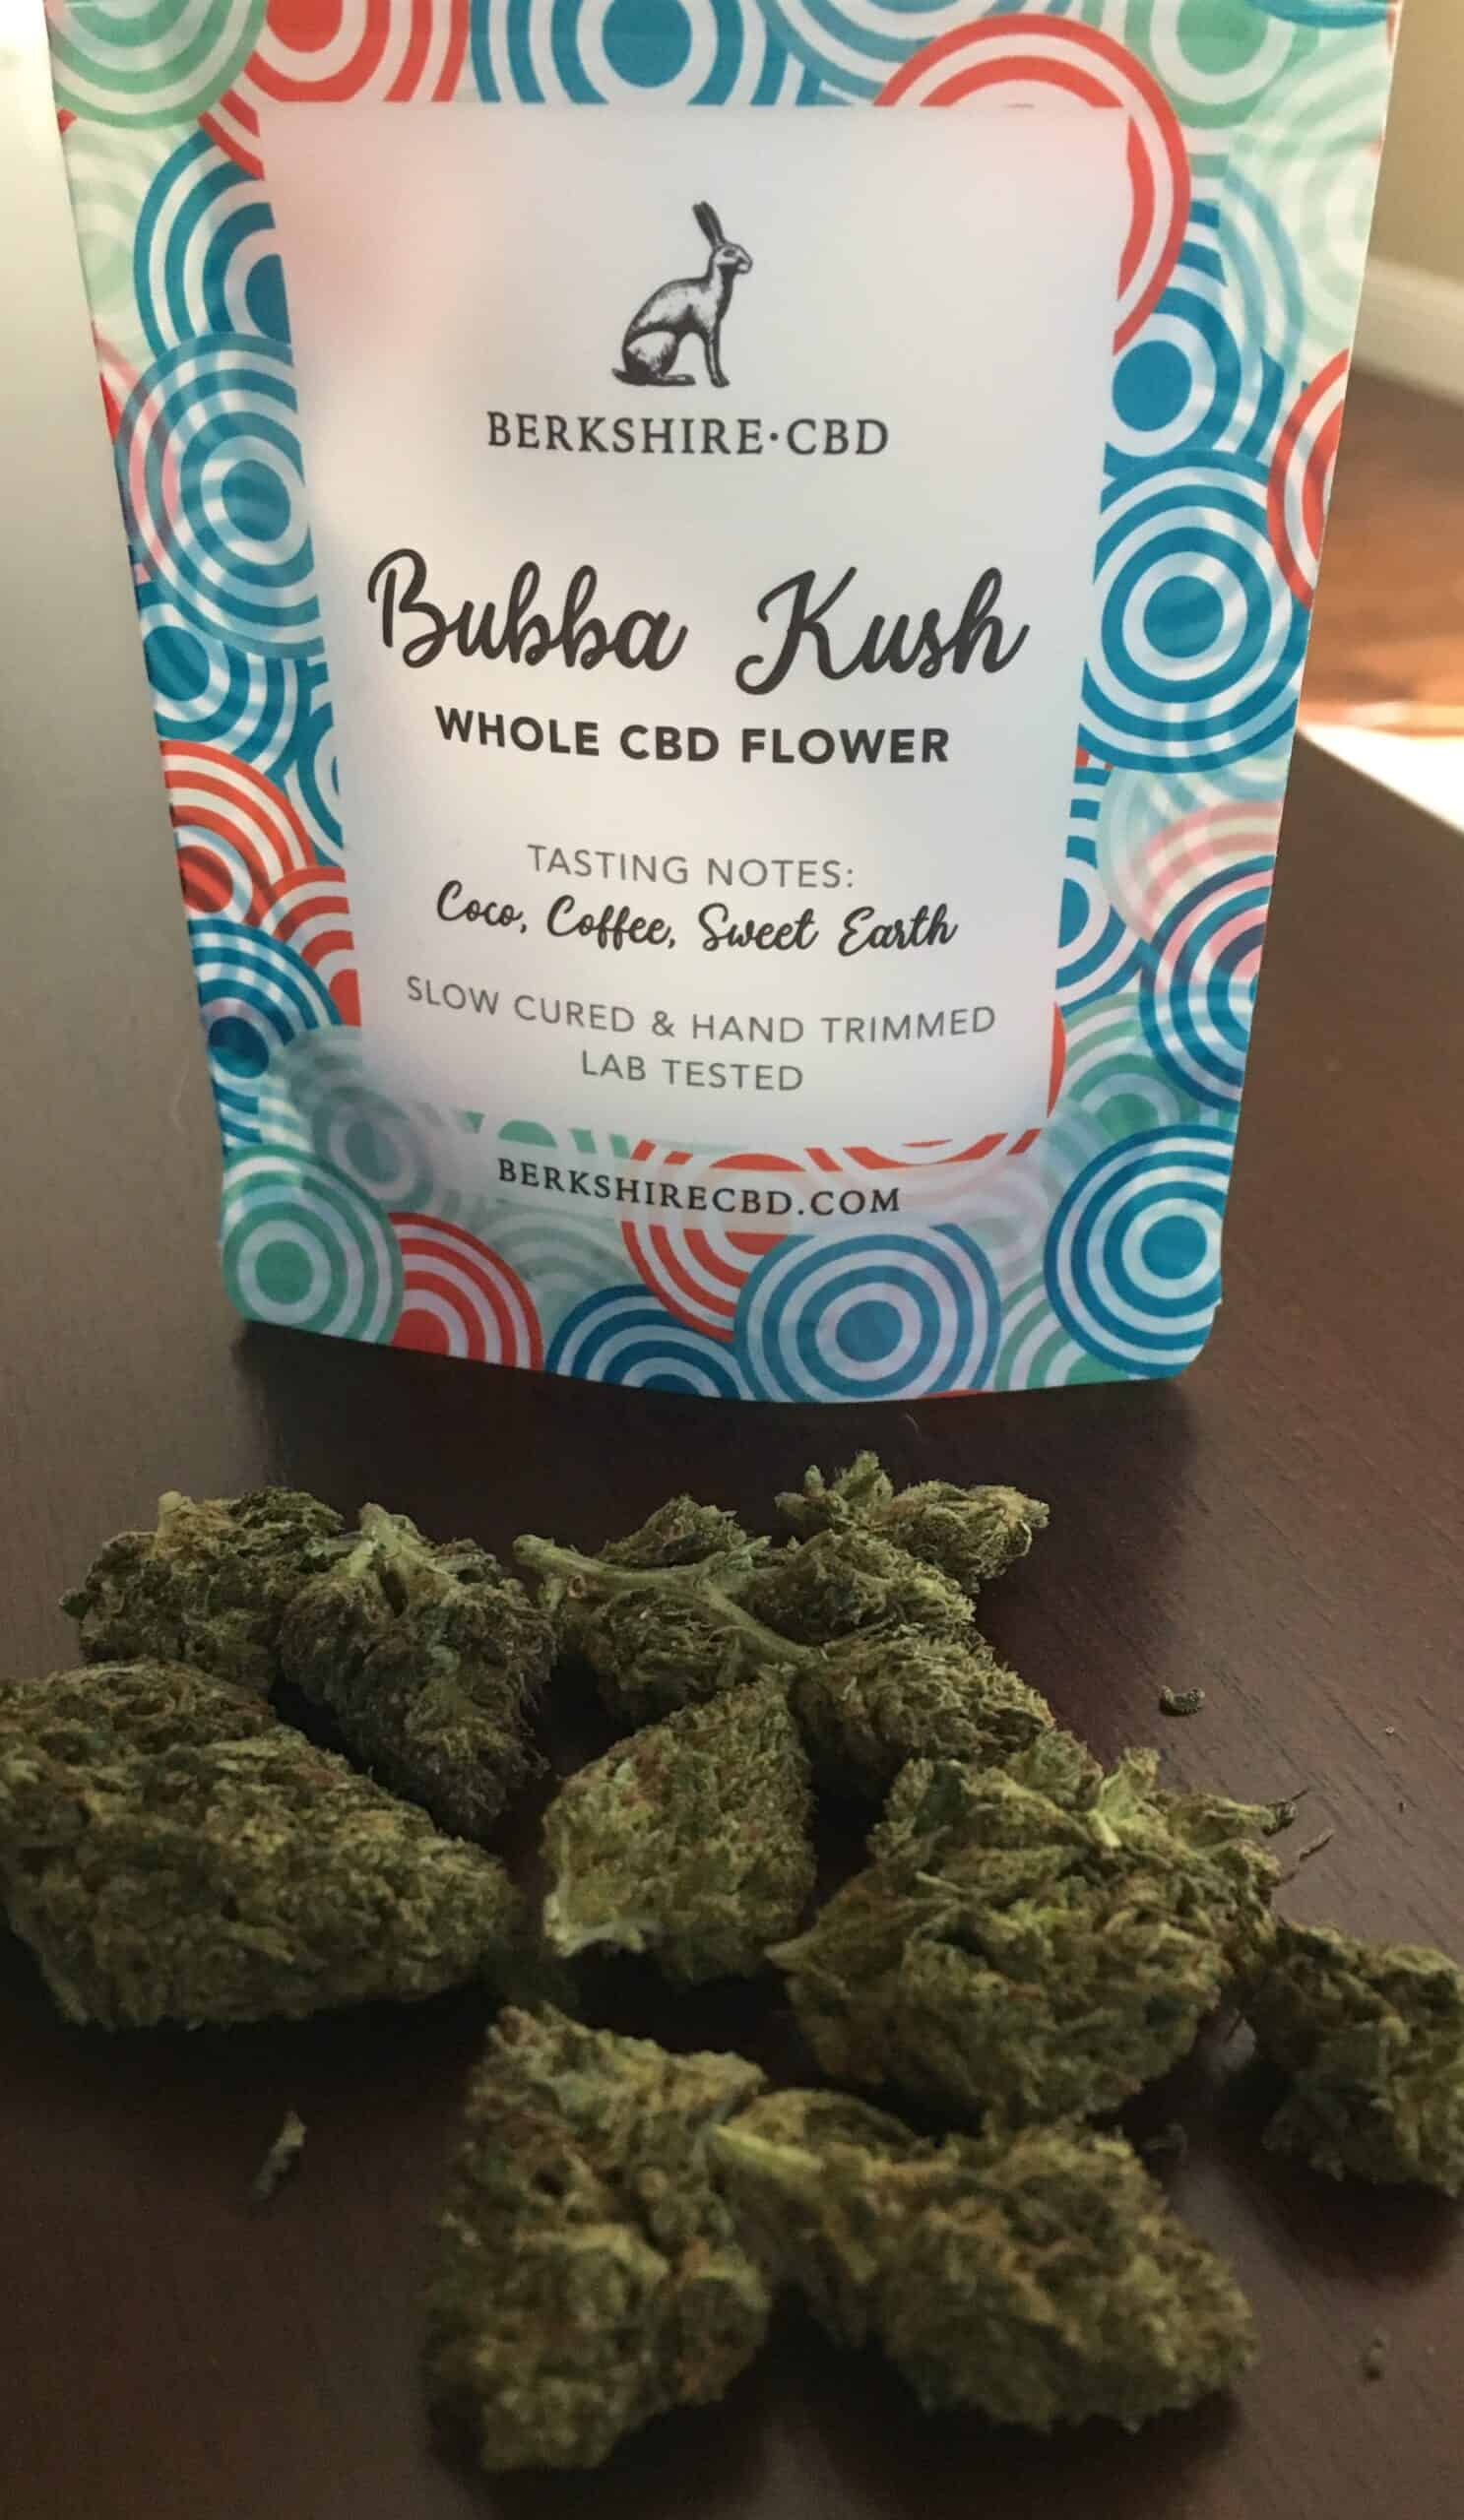 Berkshire CBD Bubba Kush Whole Hemp Flower Save On Cannabis Beauty Shot